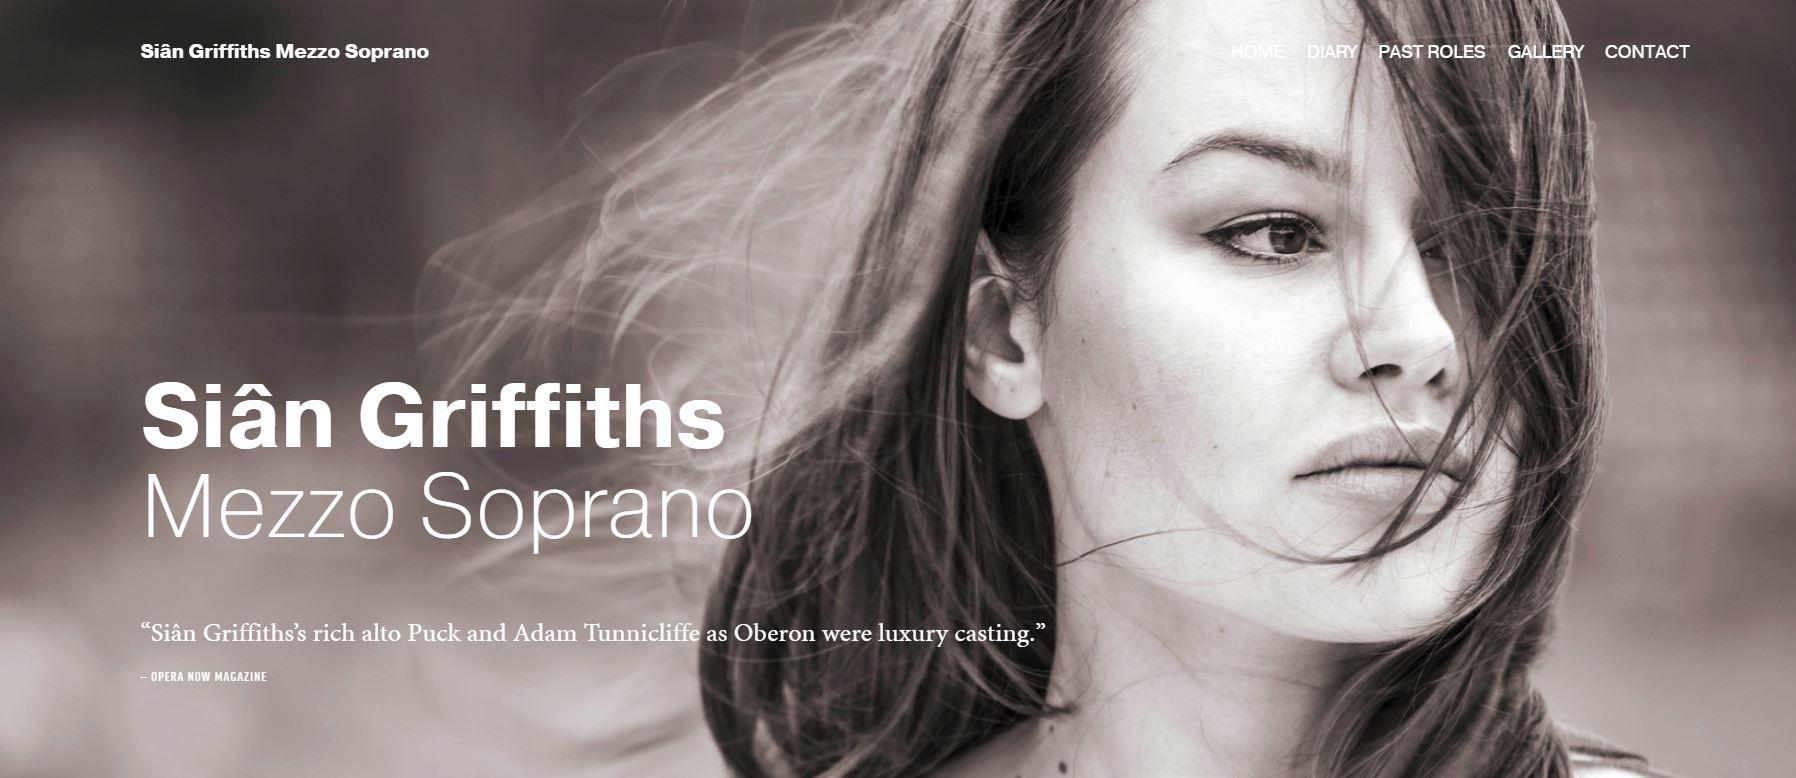 Sian Griffiths Mezzo Soprano.JPG